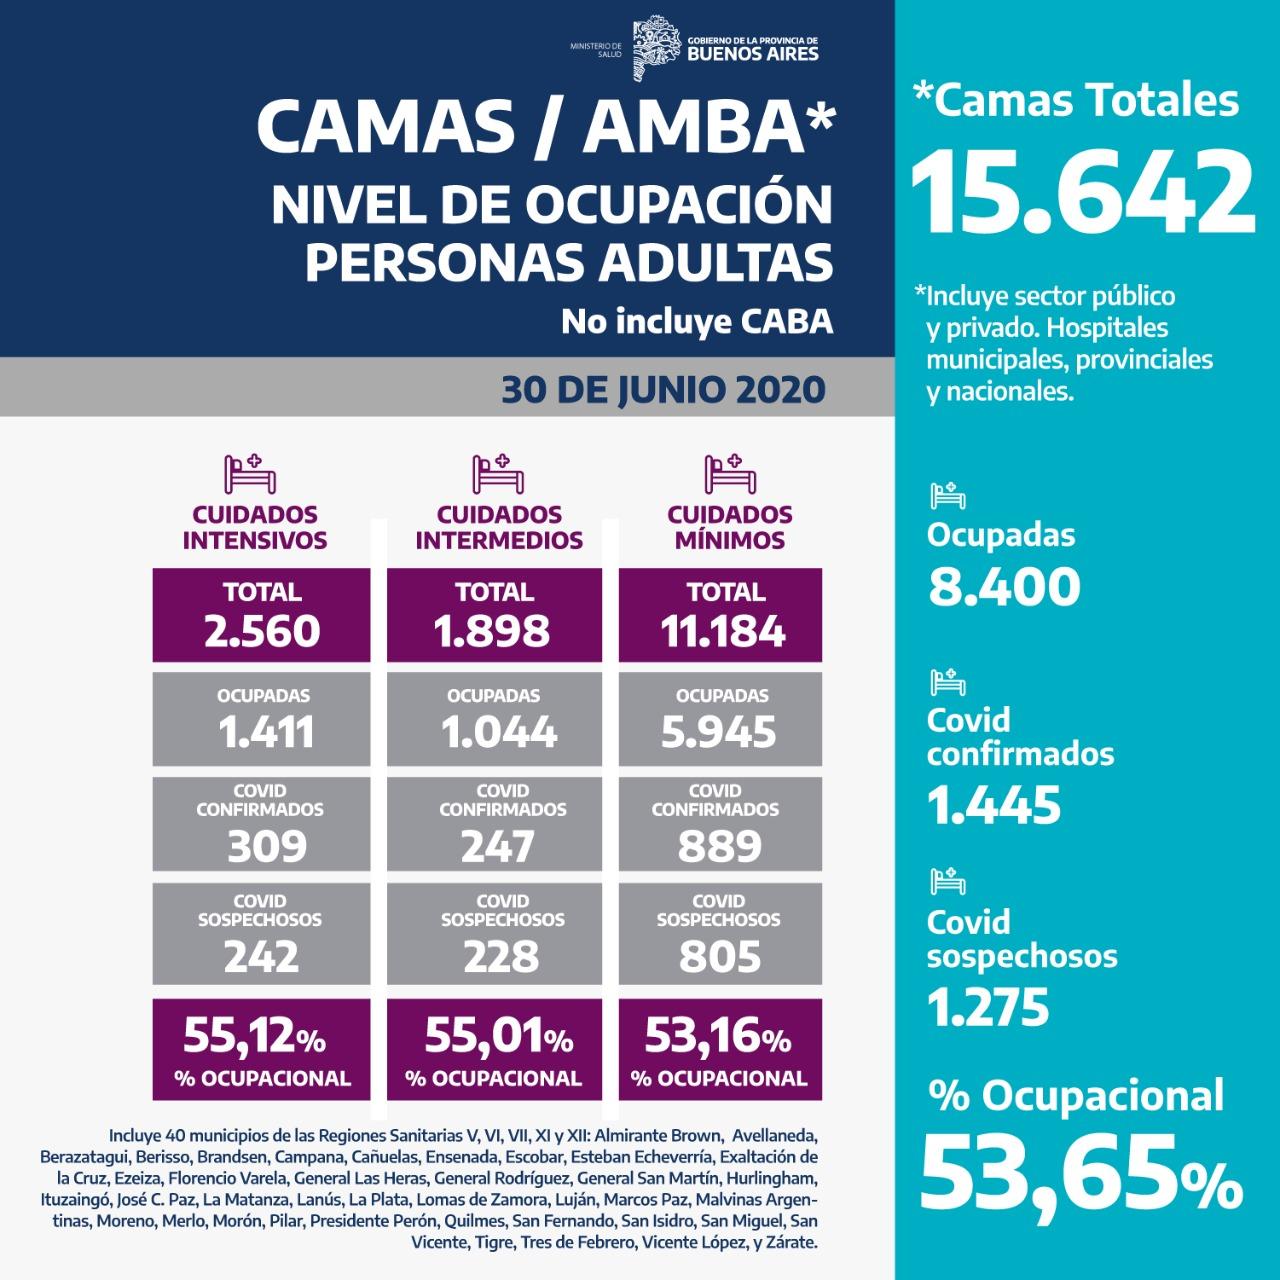 CAMAS AMBA NIVEL DE OCUPACIÓN PERSONAS ADULTAS